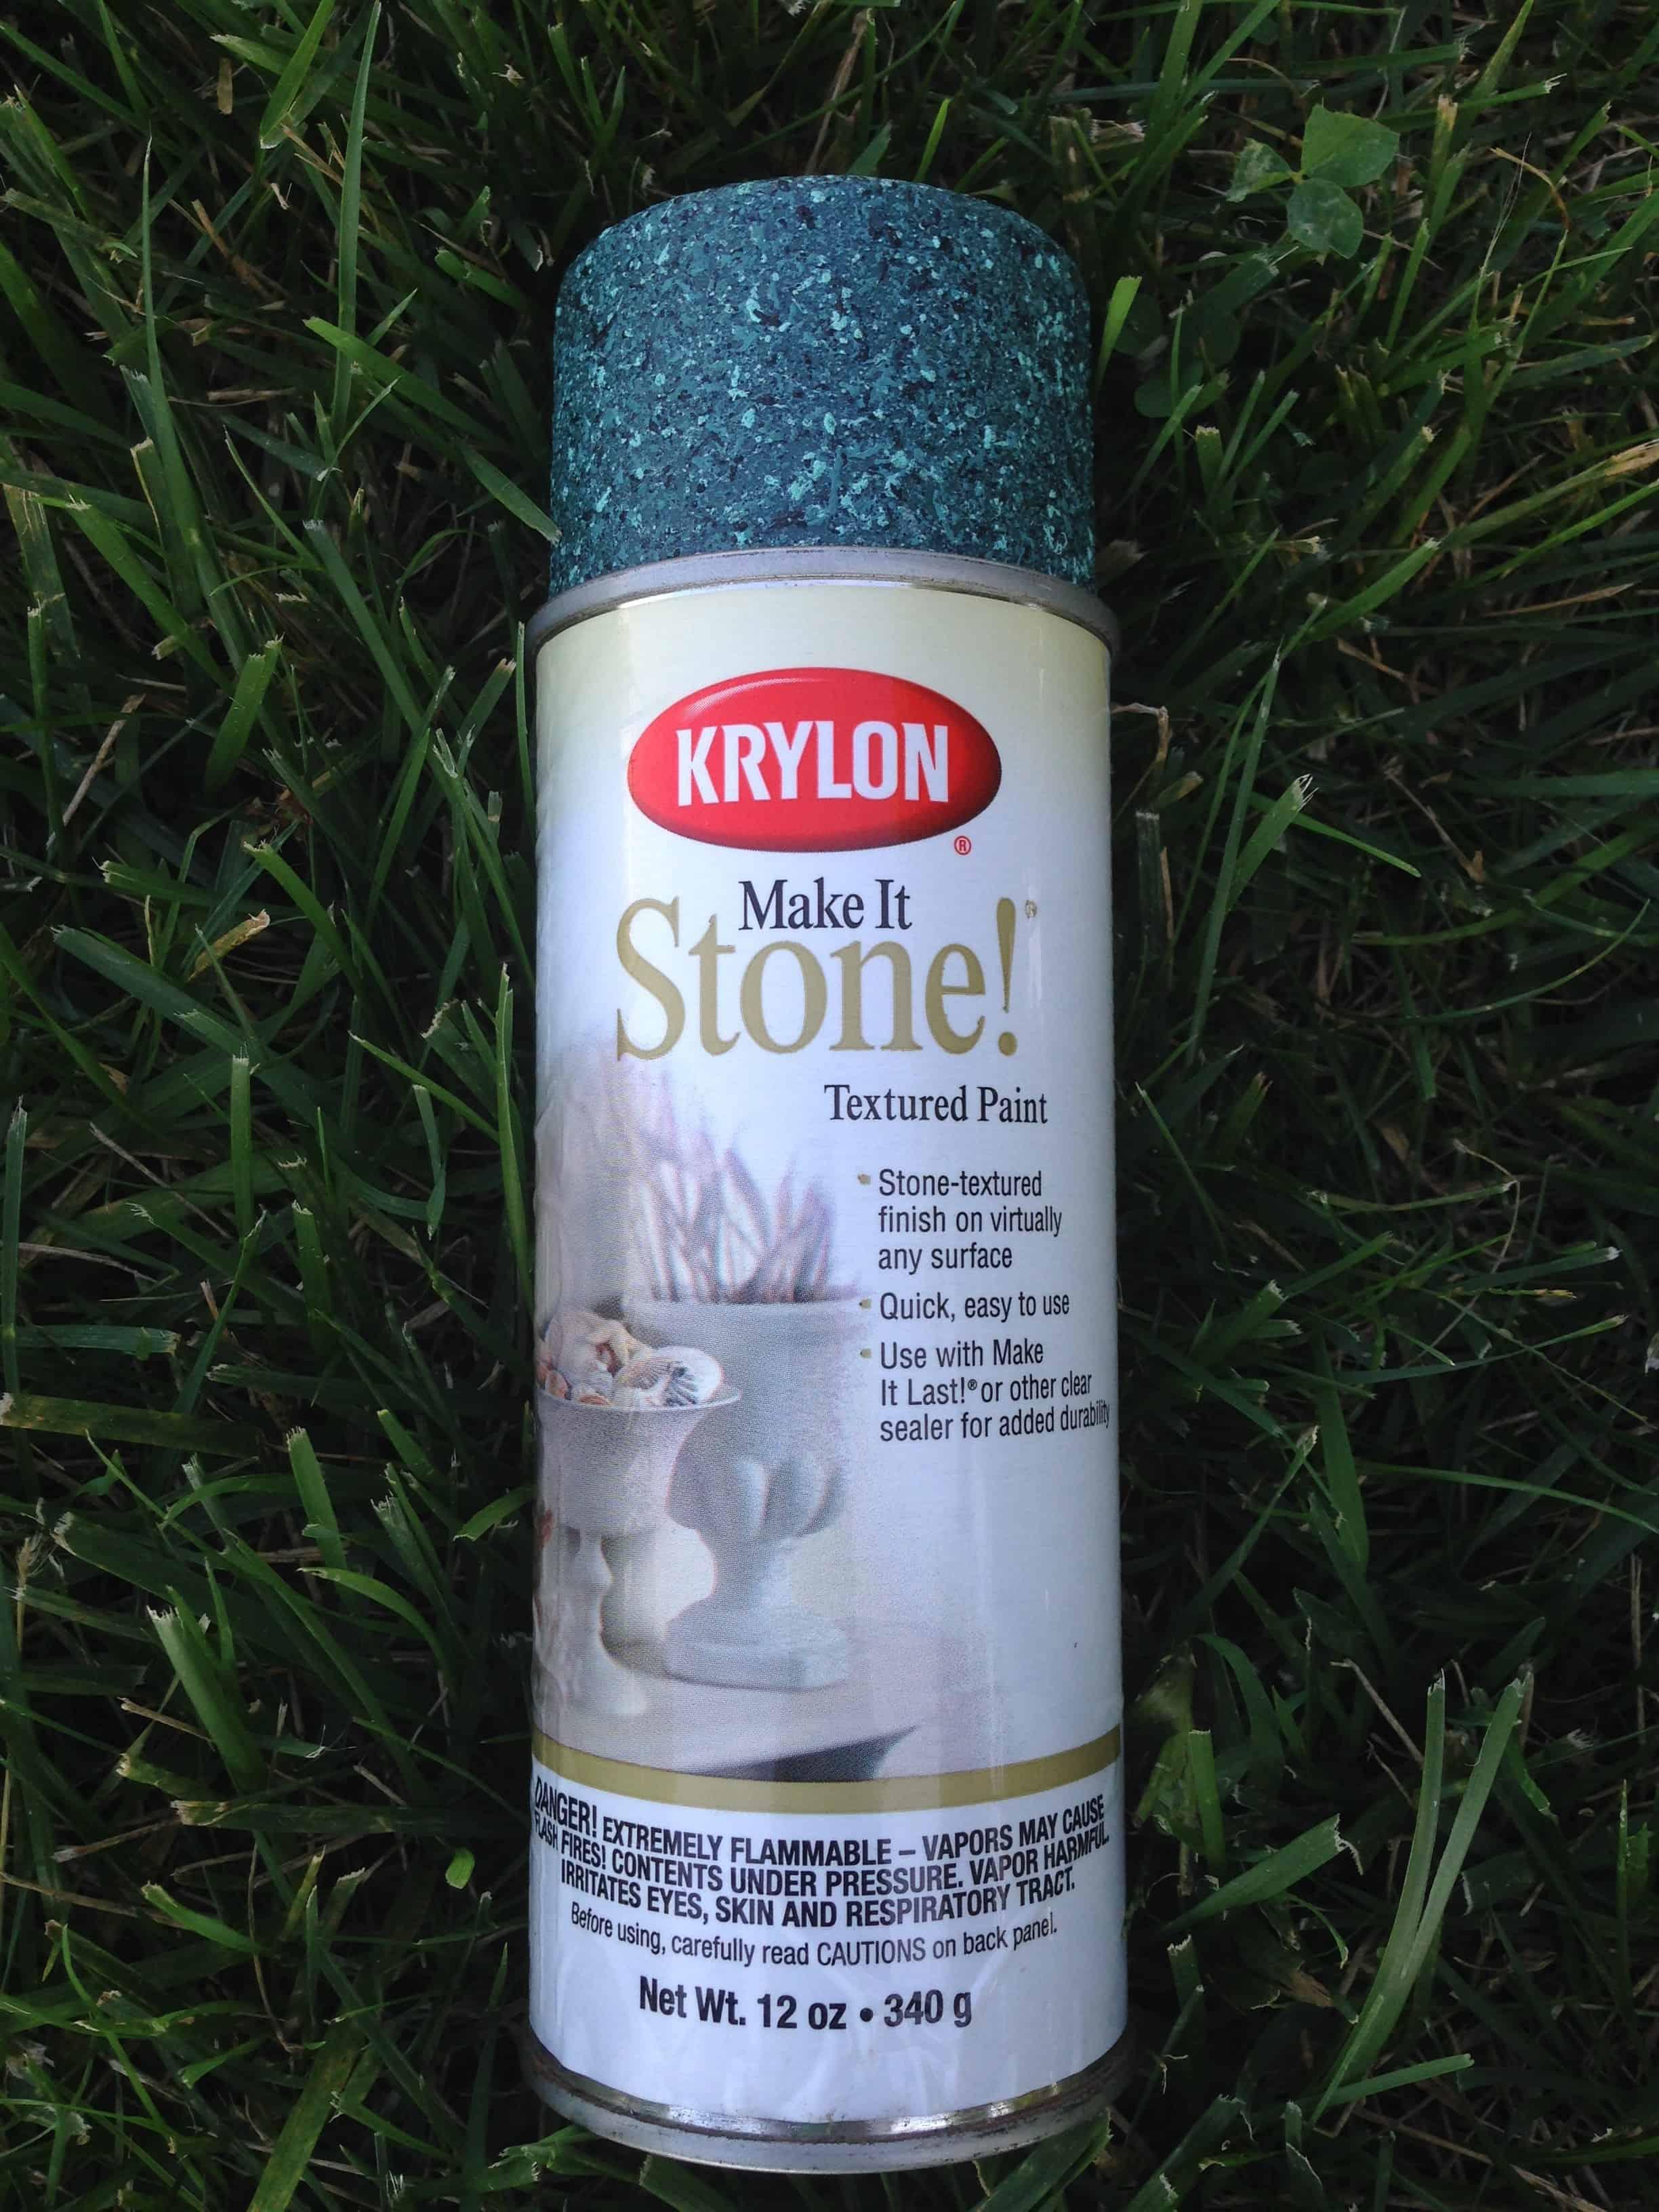 Krylon make it stone spray paint